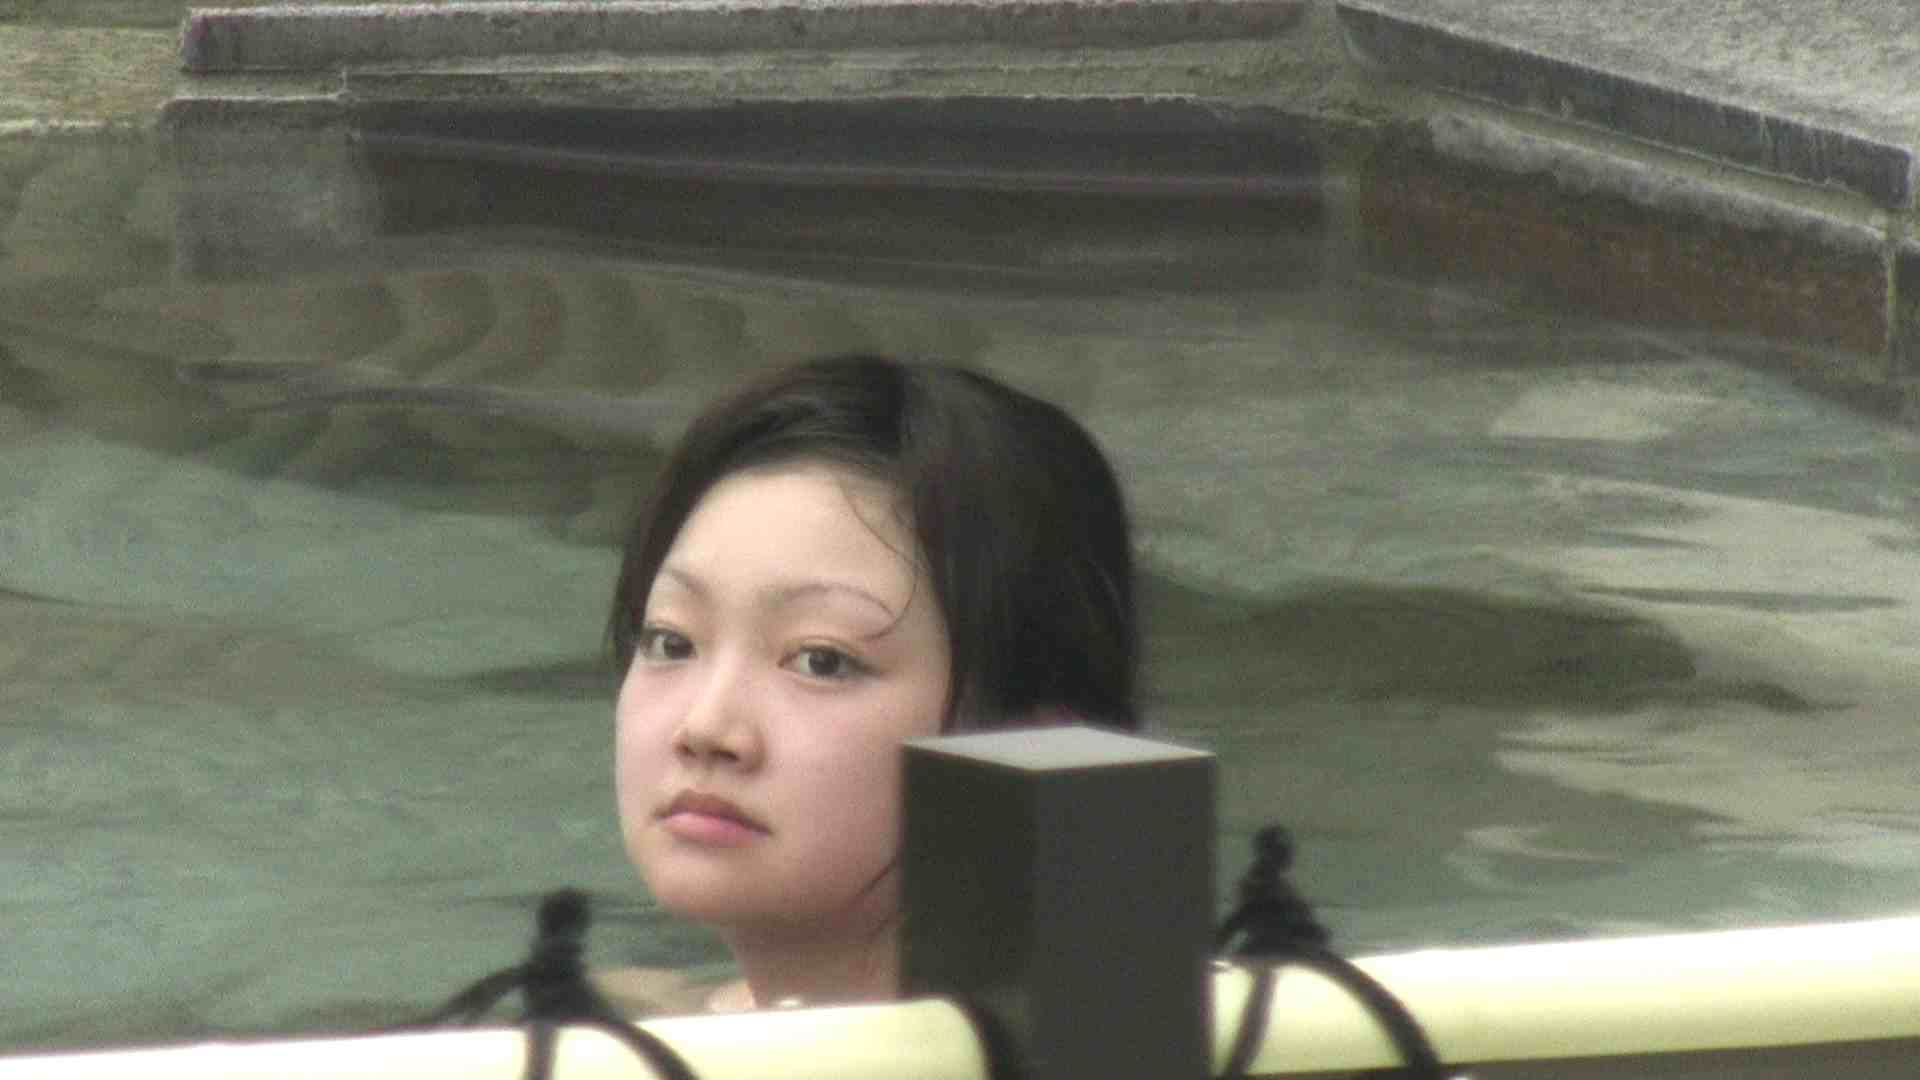 Aquaな露天風呂Vol.126 盗撮シリーズ | 露天風呂編  103PIX 3